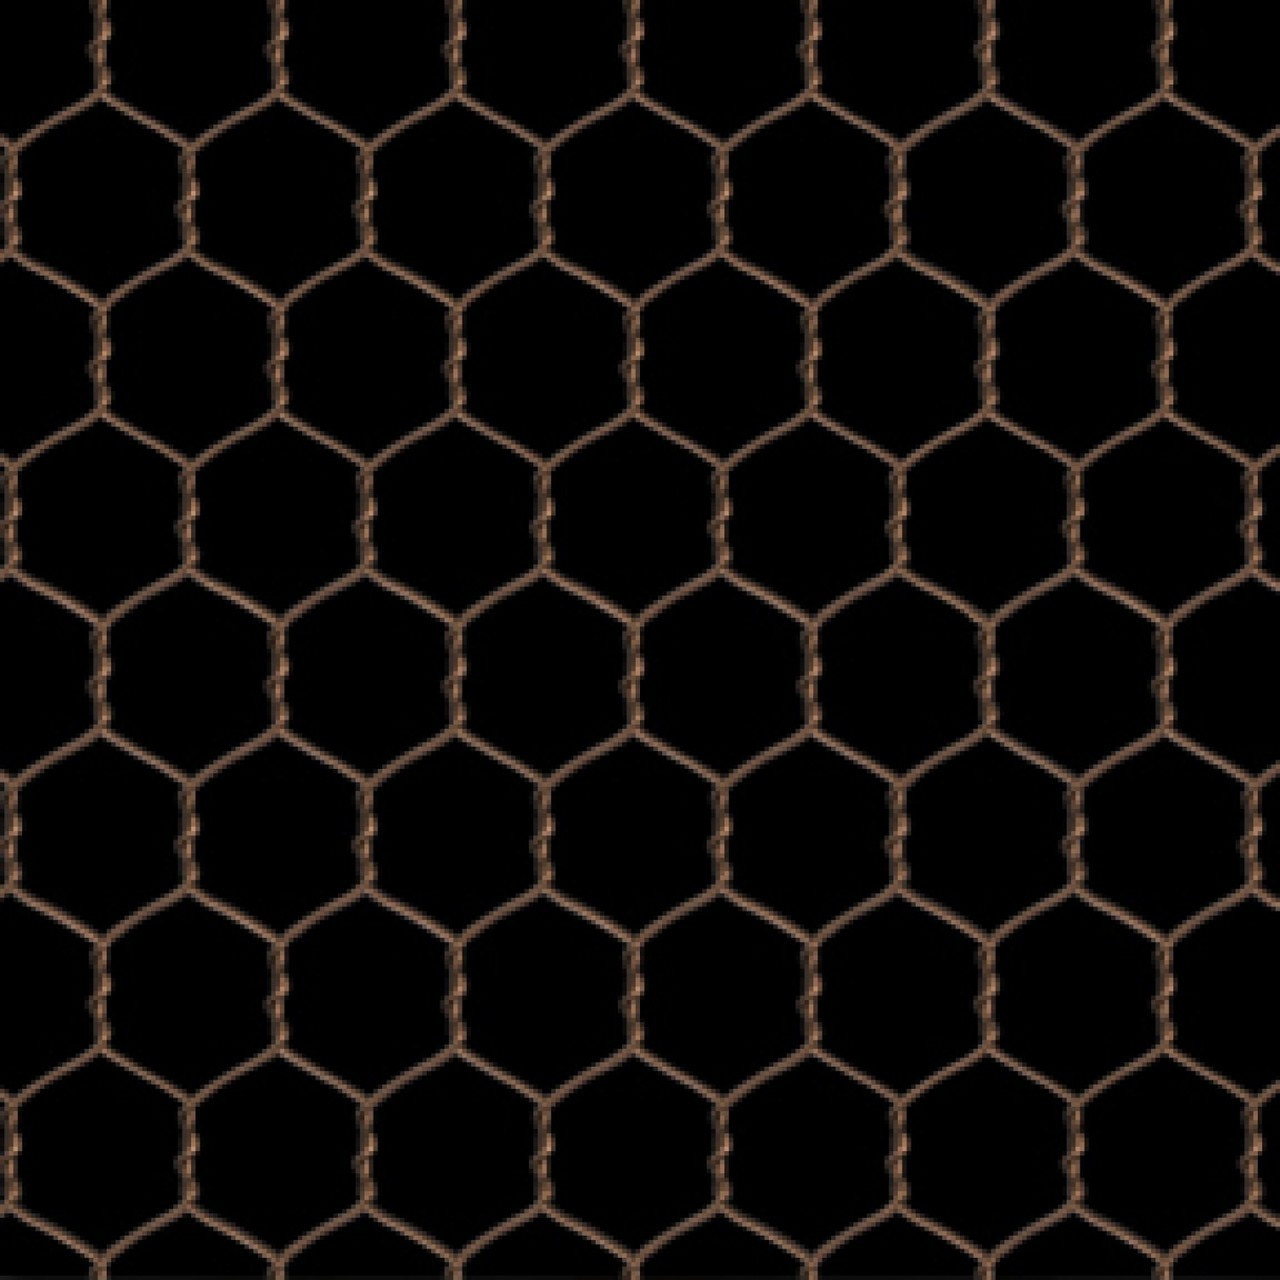 Farm Animals~Chicken Wire/Black Cotton Fabric by Elizabeth Studios